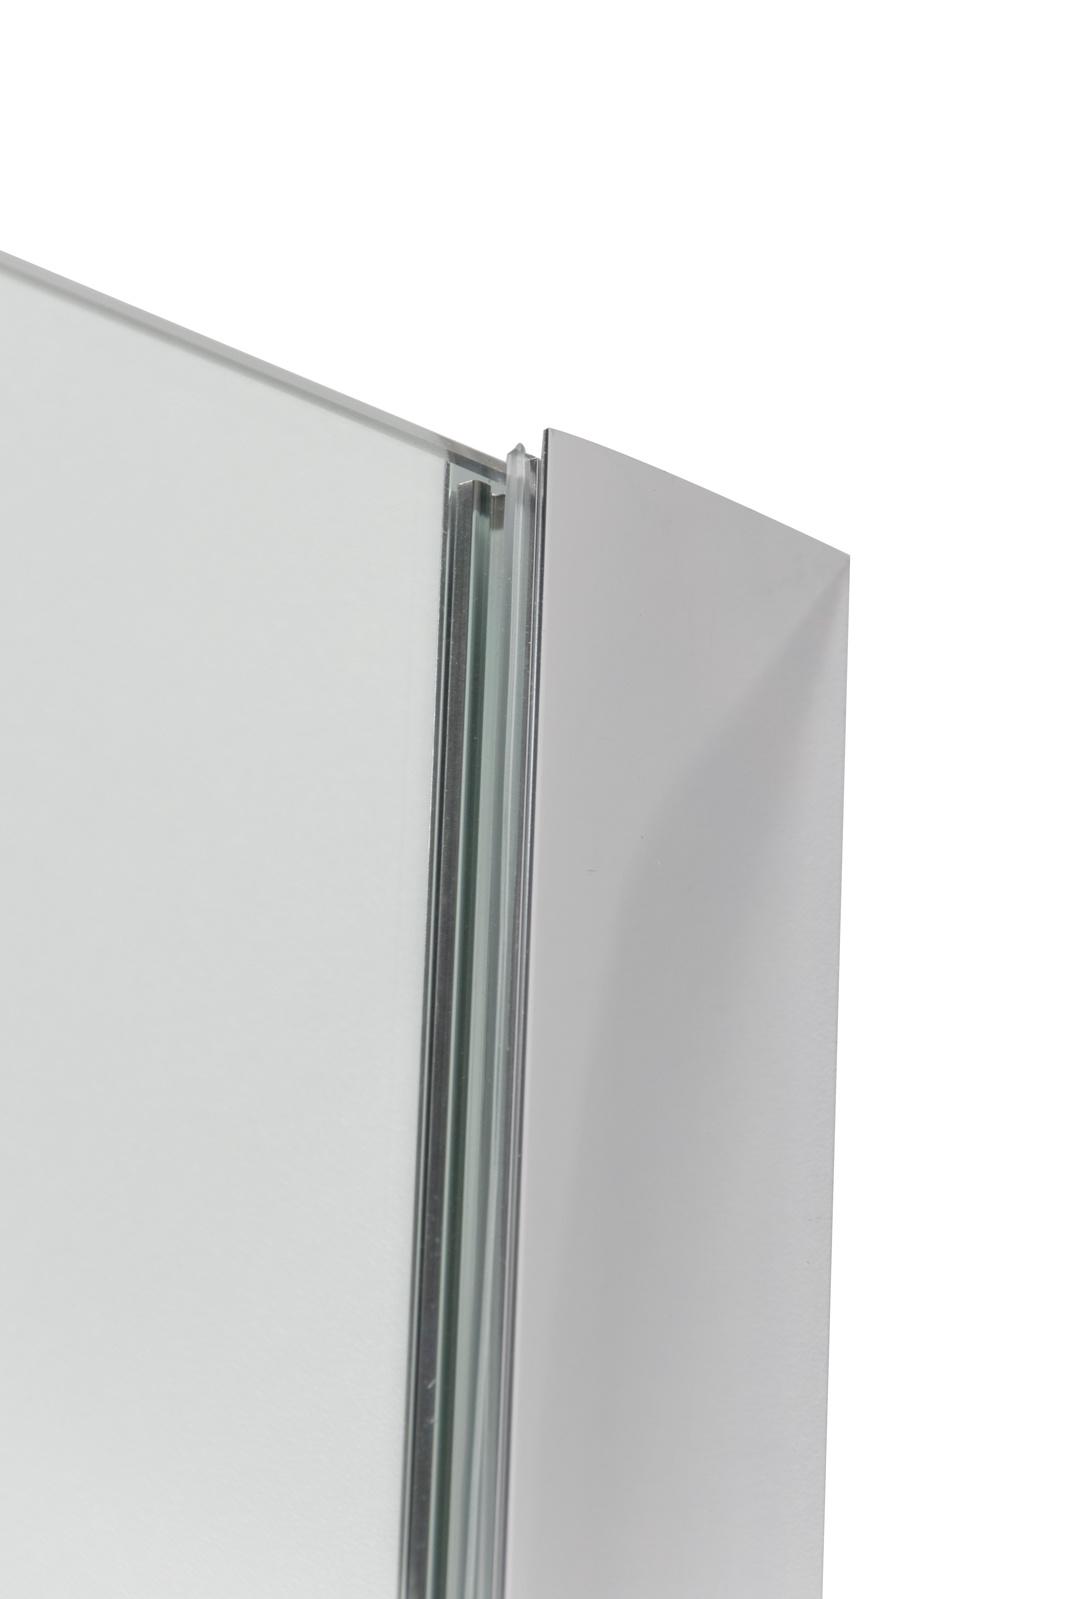 Linea Uno Set Gšteborg 120 x 200 cm + Tulta Seitenwand 35 x 200 cm